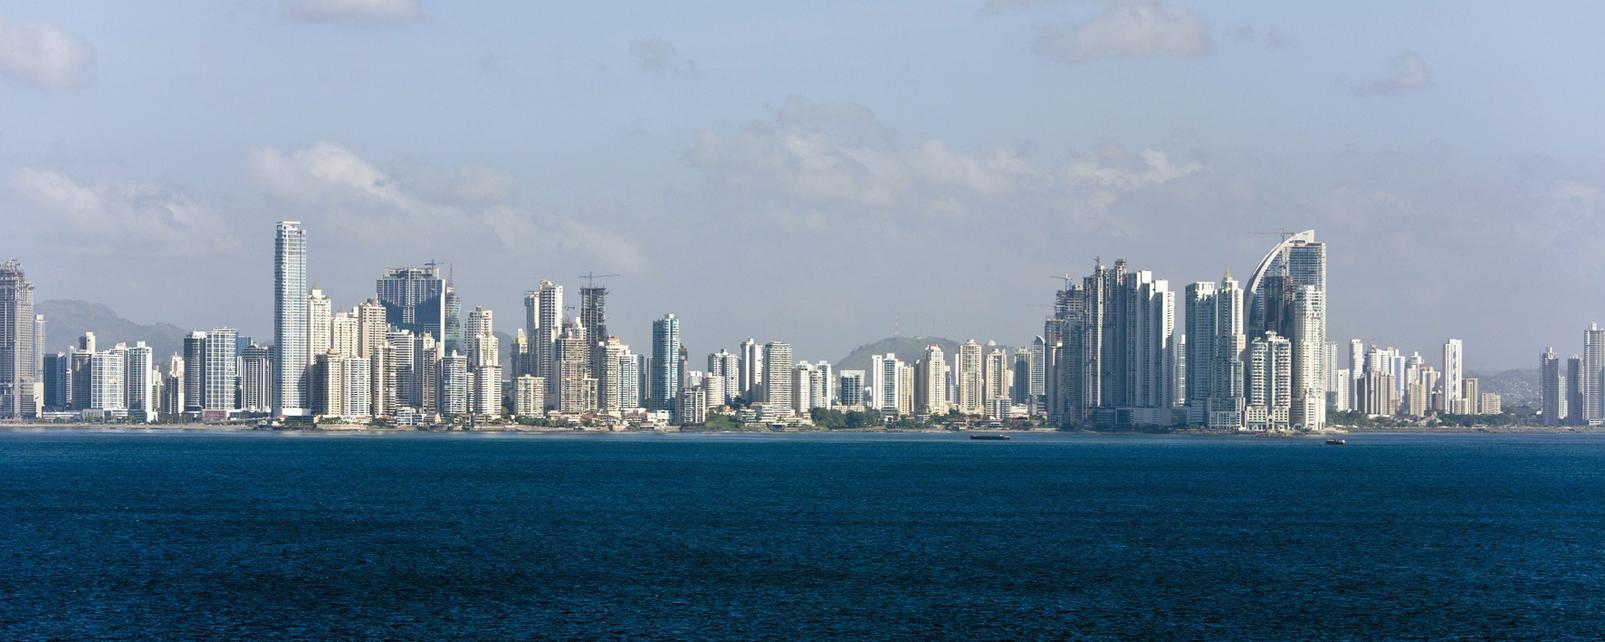 panama city wetter